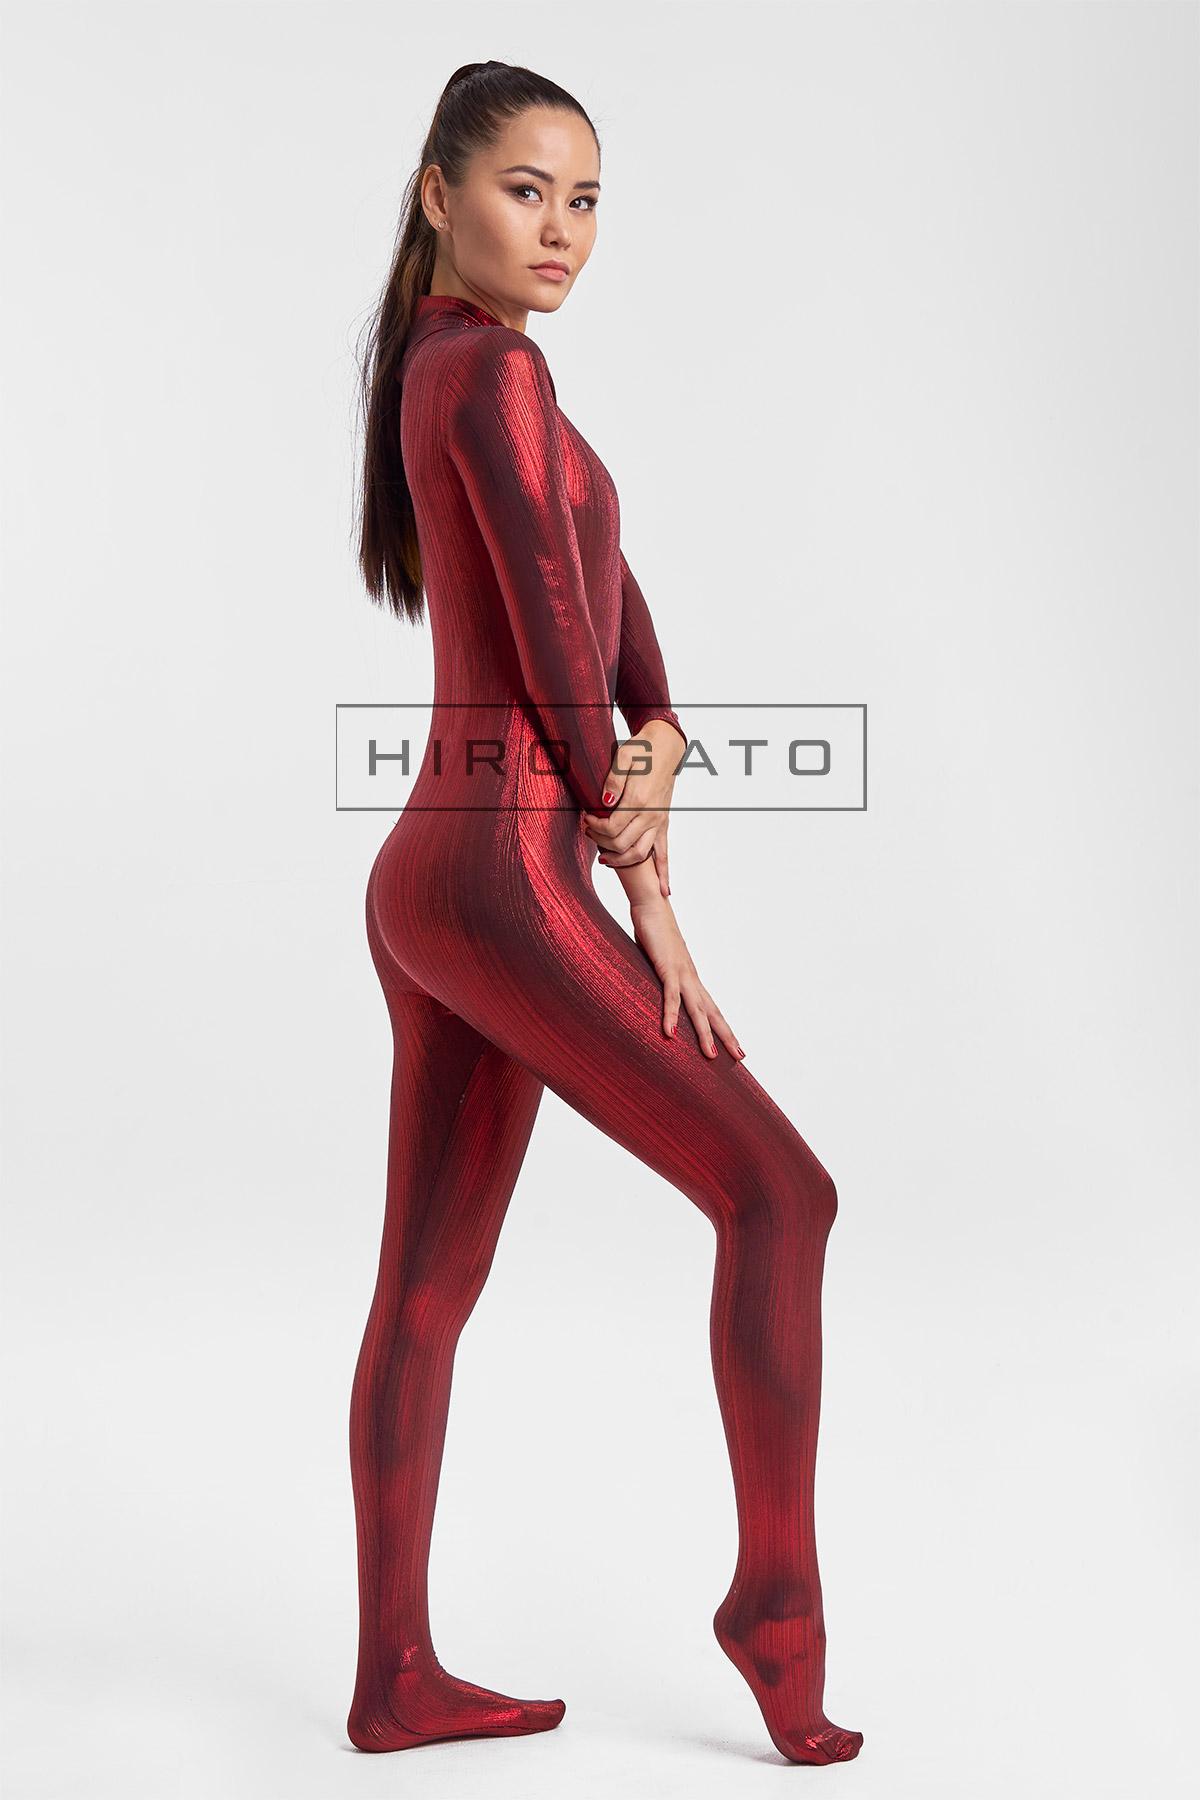 Premium Shiny Spandex Lycra High Leg Cut Leotard Red